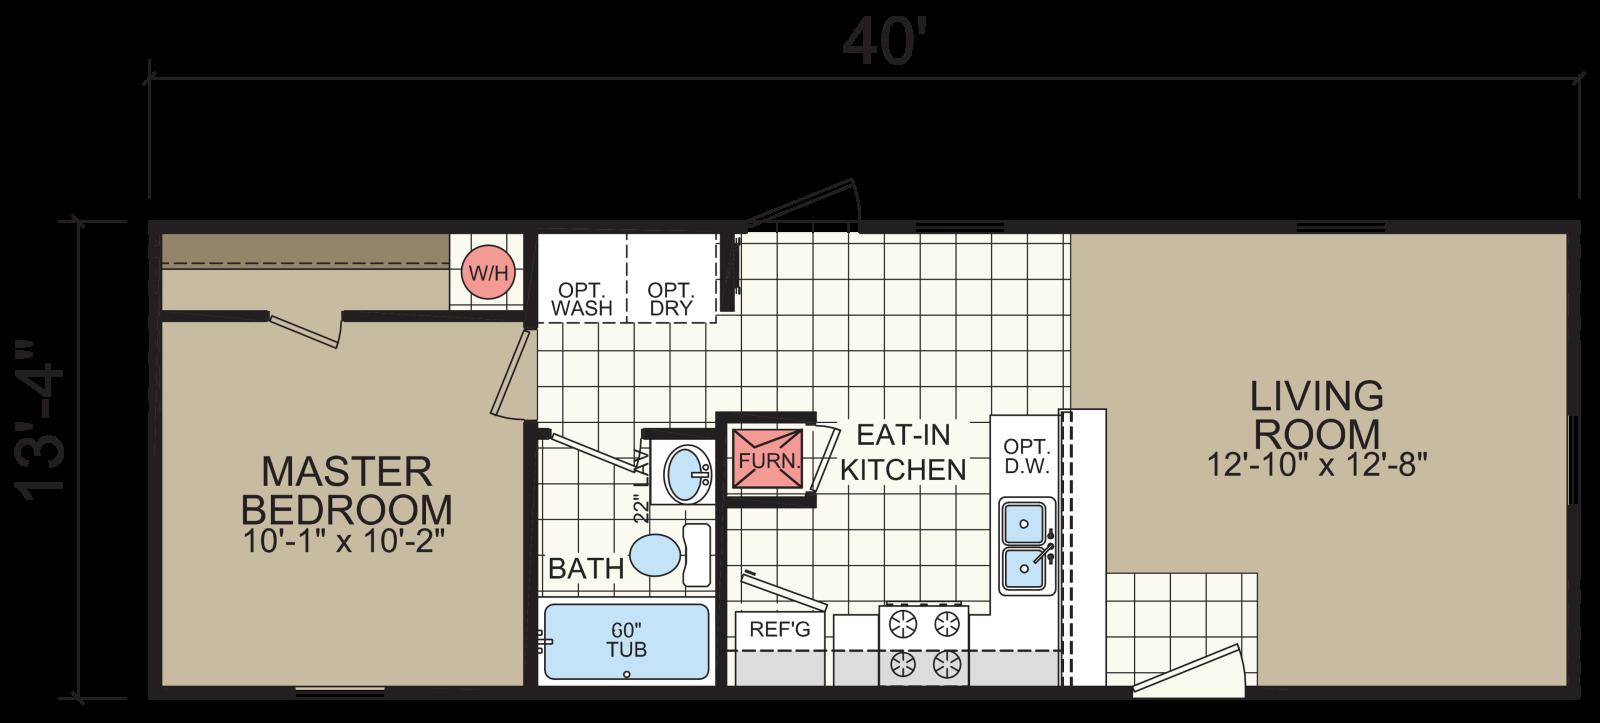 Advantage 1444 201 Redman Homes Indiana